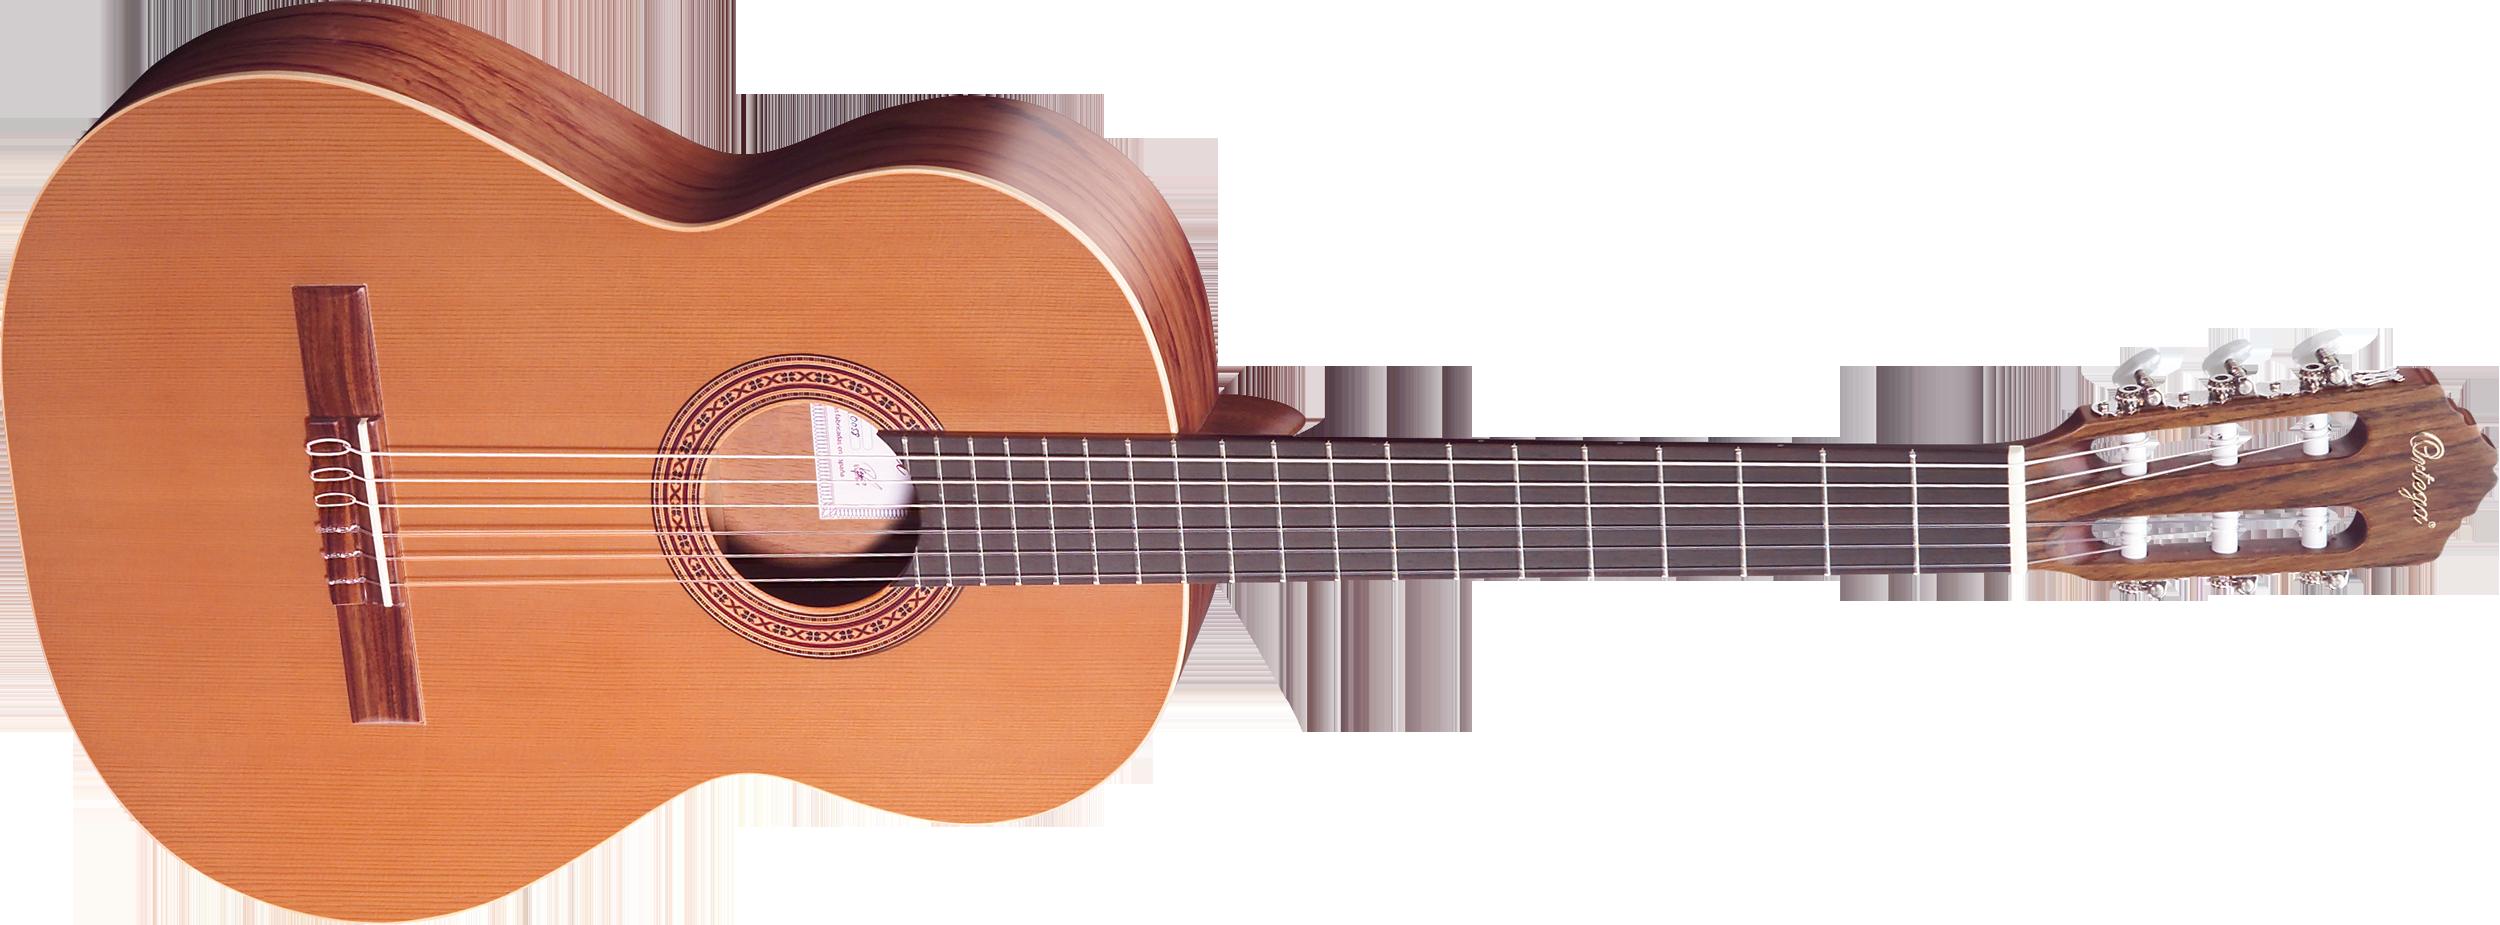 Acoustic Classic Guitar Png Image Acoustic Guitar Acoustic Guitar Strings Acoustic Electric